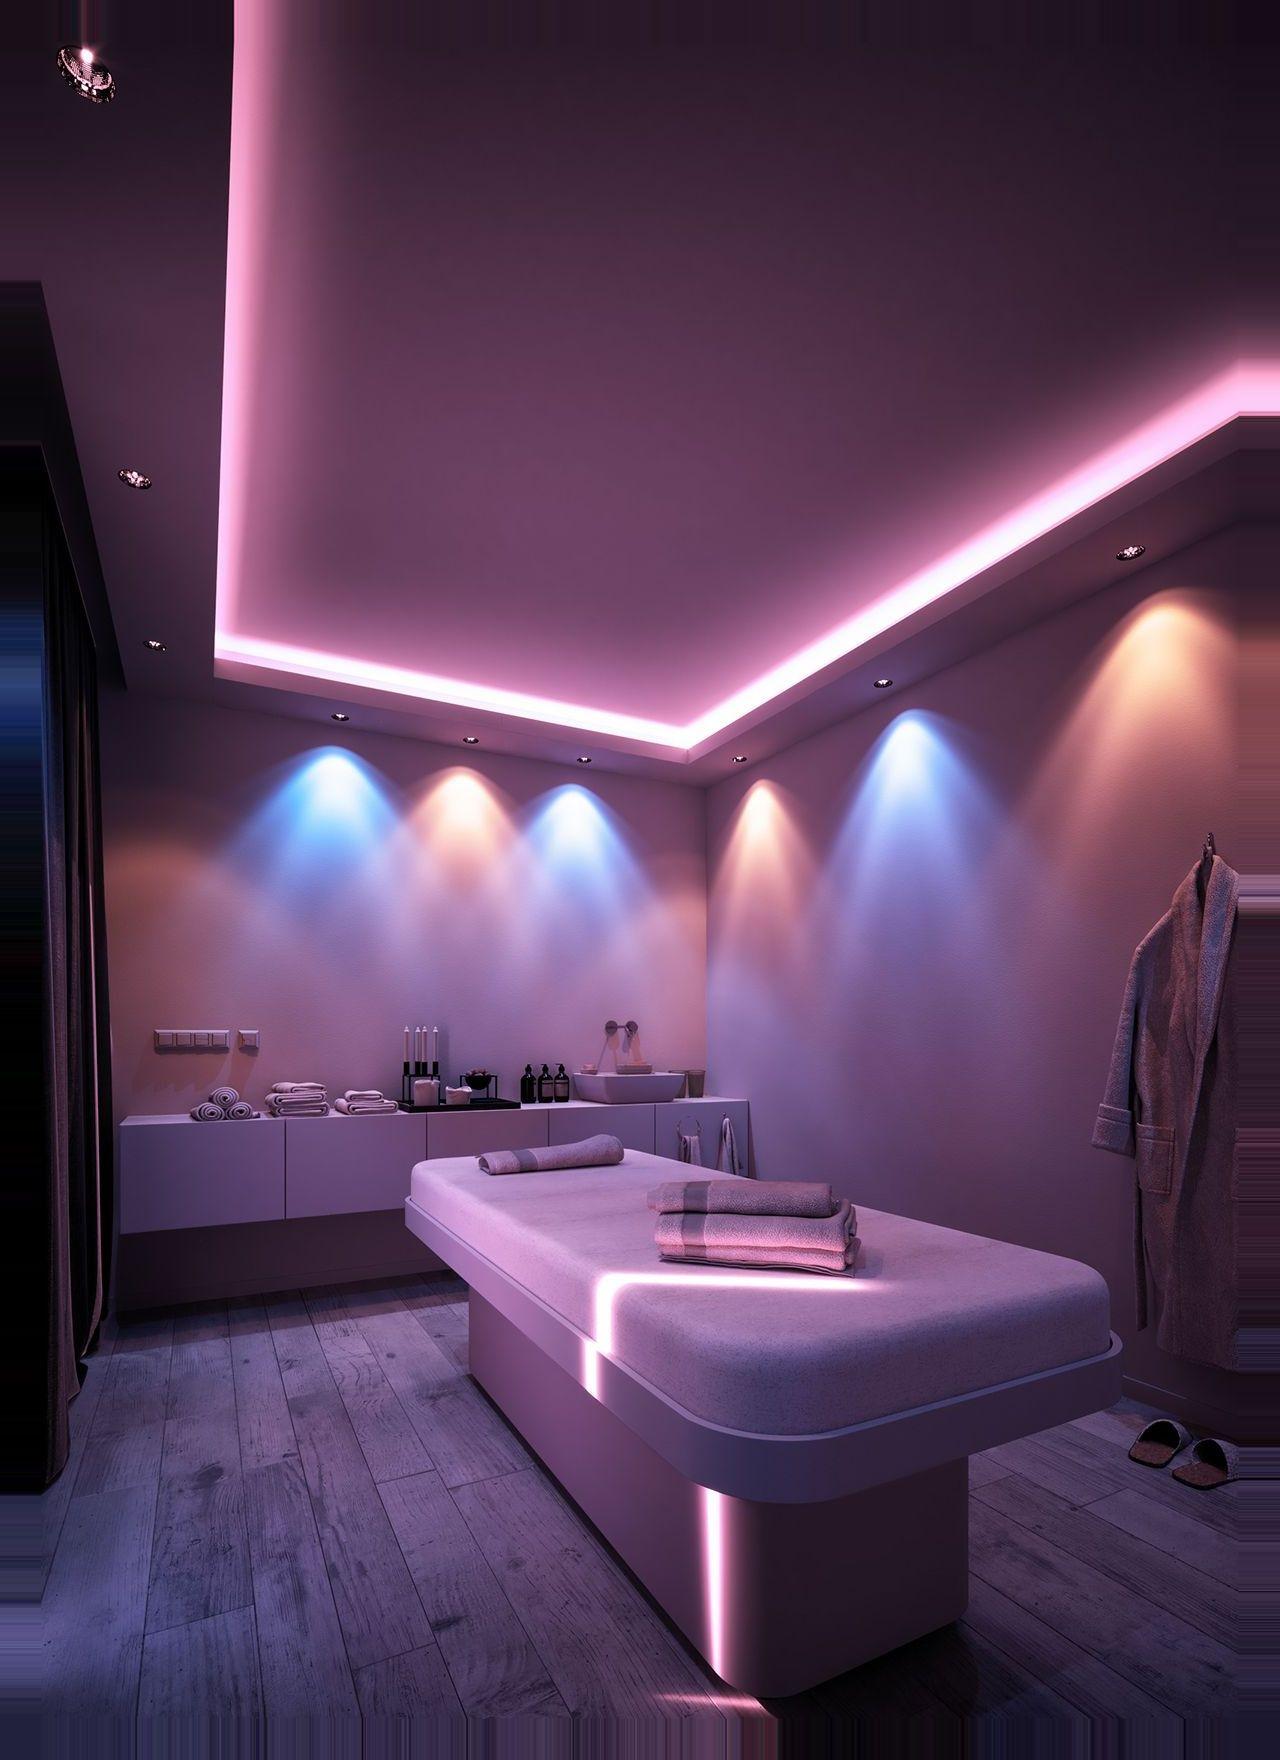 , #Esti Ginzburg beauty #Spa #treatment Spa Treatment Spa Treatment on Behance #anja #rubik, Anja Rubik Blog, Anja Rubik Blog